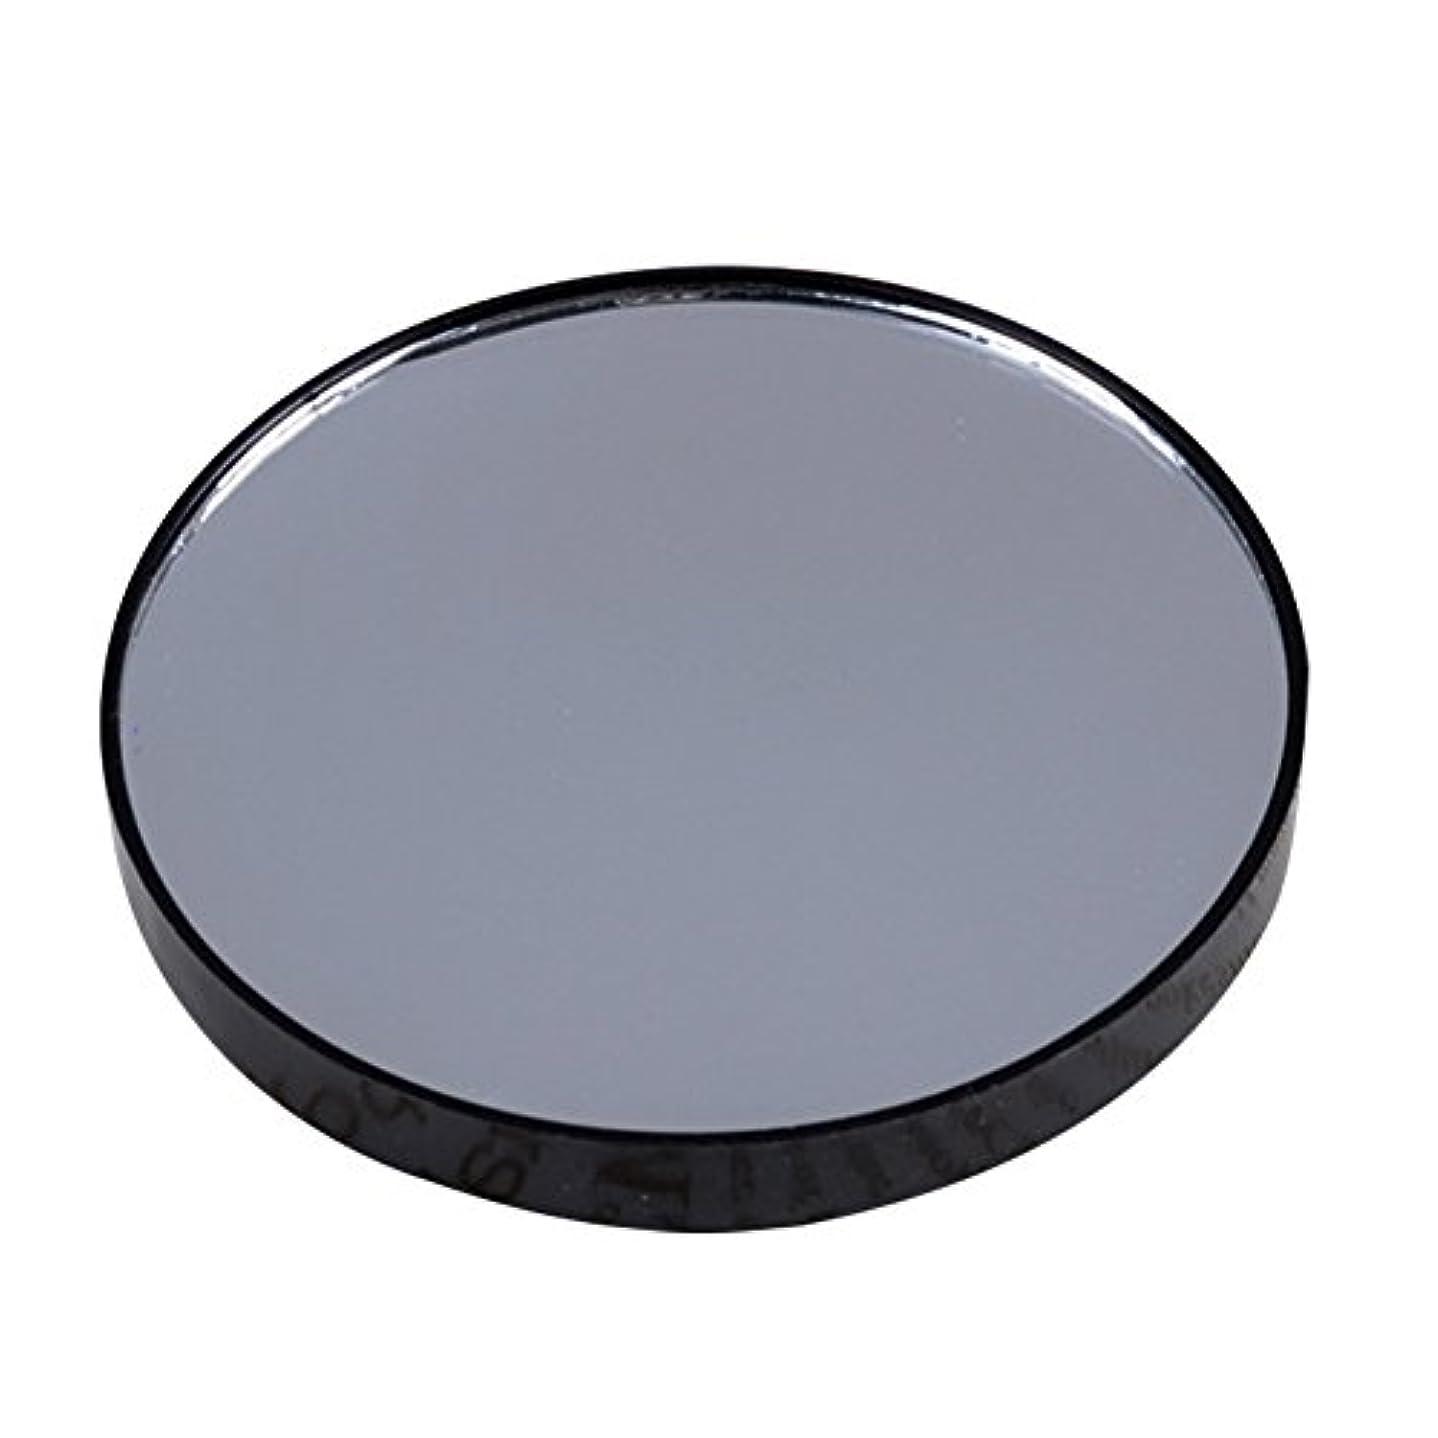 YideaHome メイクアップミラー 化粧鏡 拡大鏡 5倍 10倍 15倍 強力吸盤付き メイクミラー 化粧ミラー (10倍)